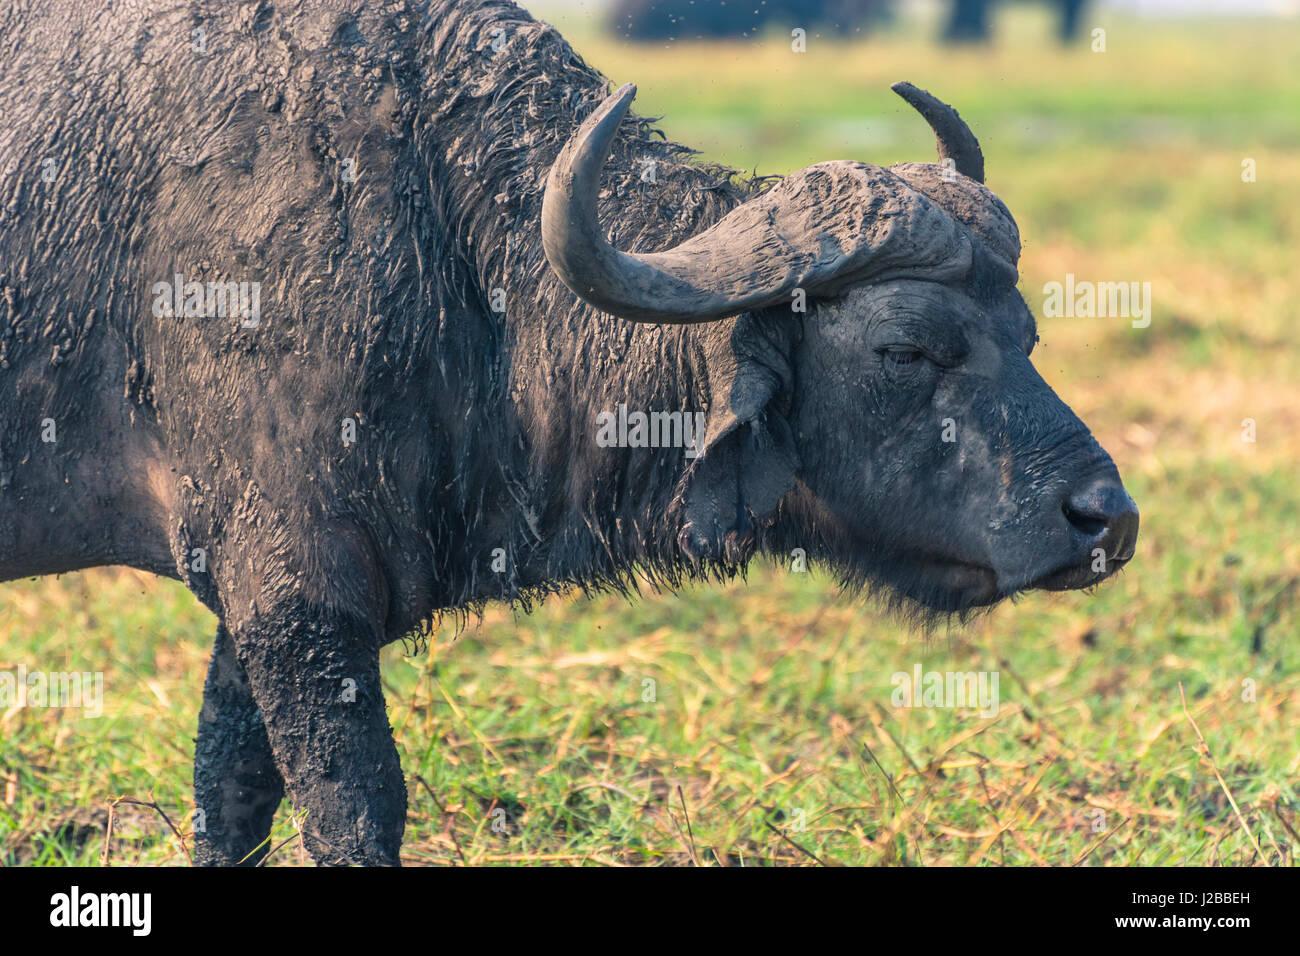 Botswana. Chobe National Park. Old male Cape Buffalo (Syncerus caffer) on the shore of the Chobe river. - Stock-Bilder